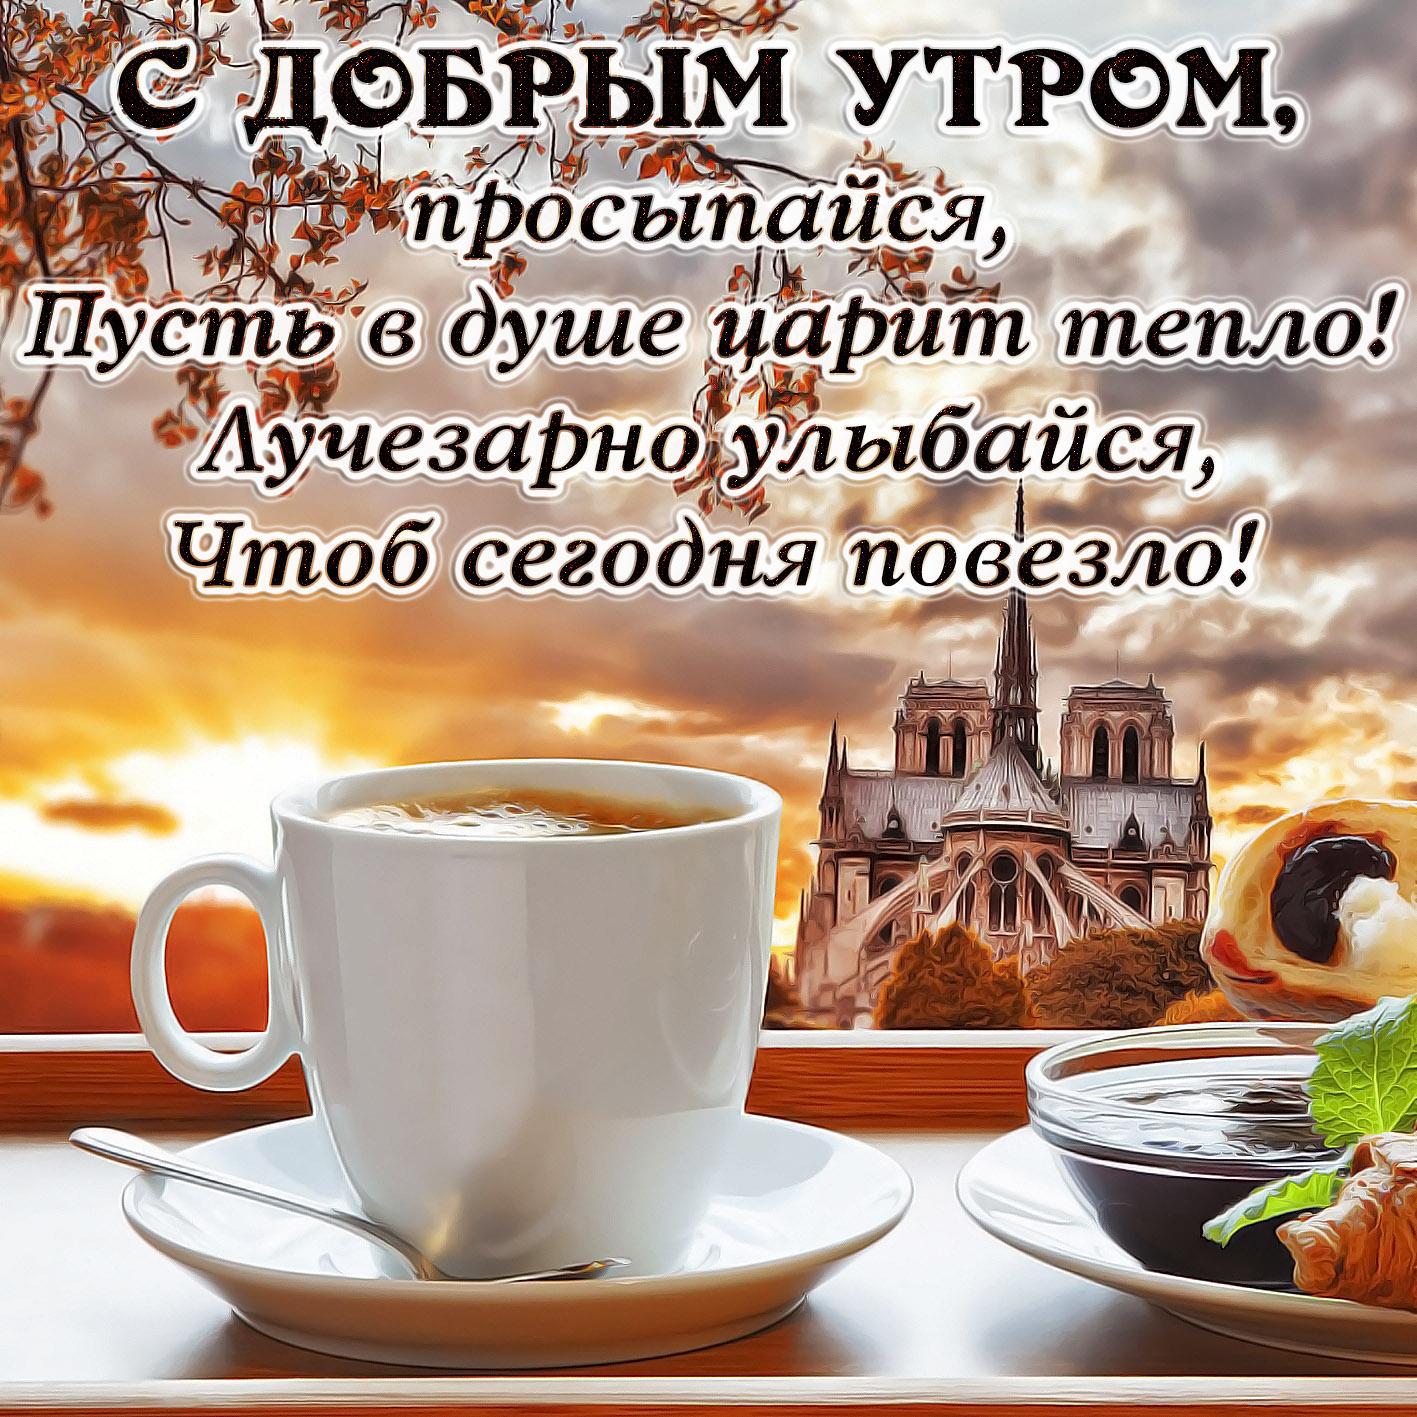 Самого доброго утра картинки с пожеланием, картинки для